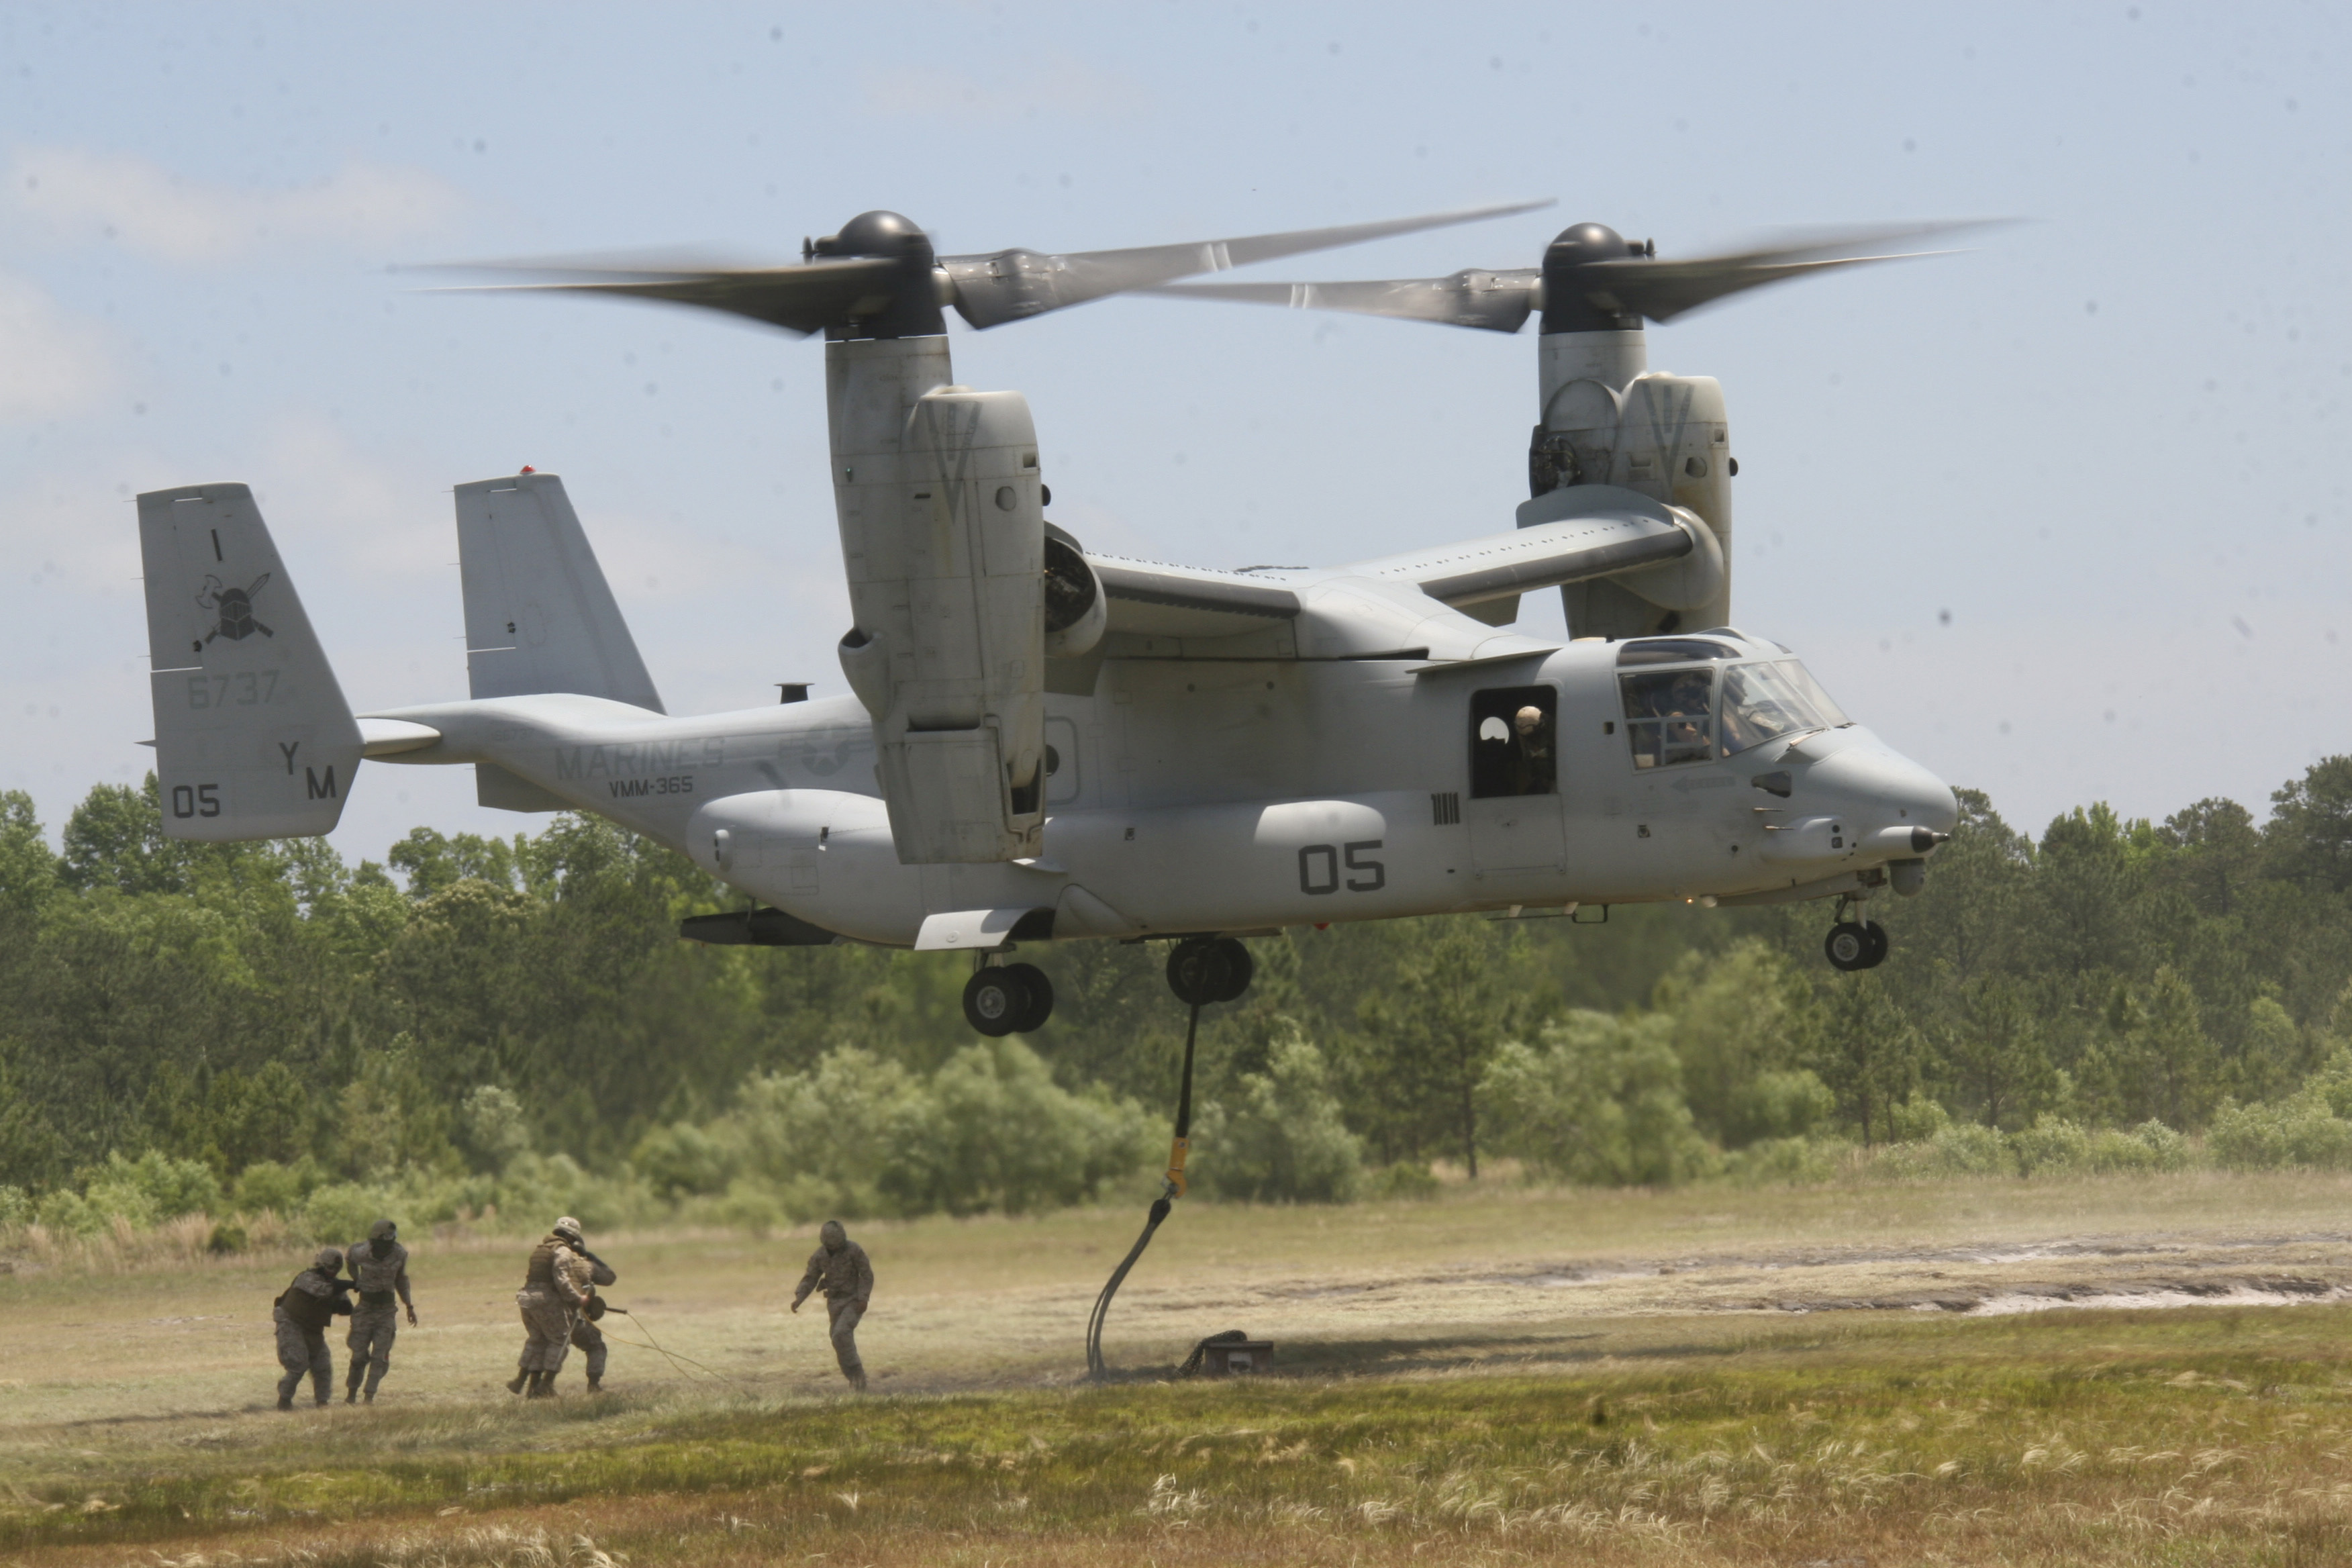 Elicottero Osprey : File defense news photo m h an mv b